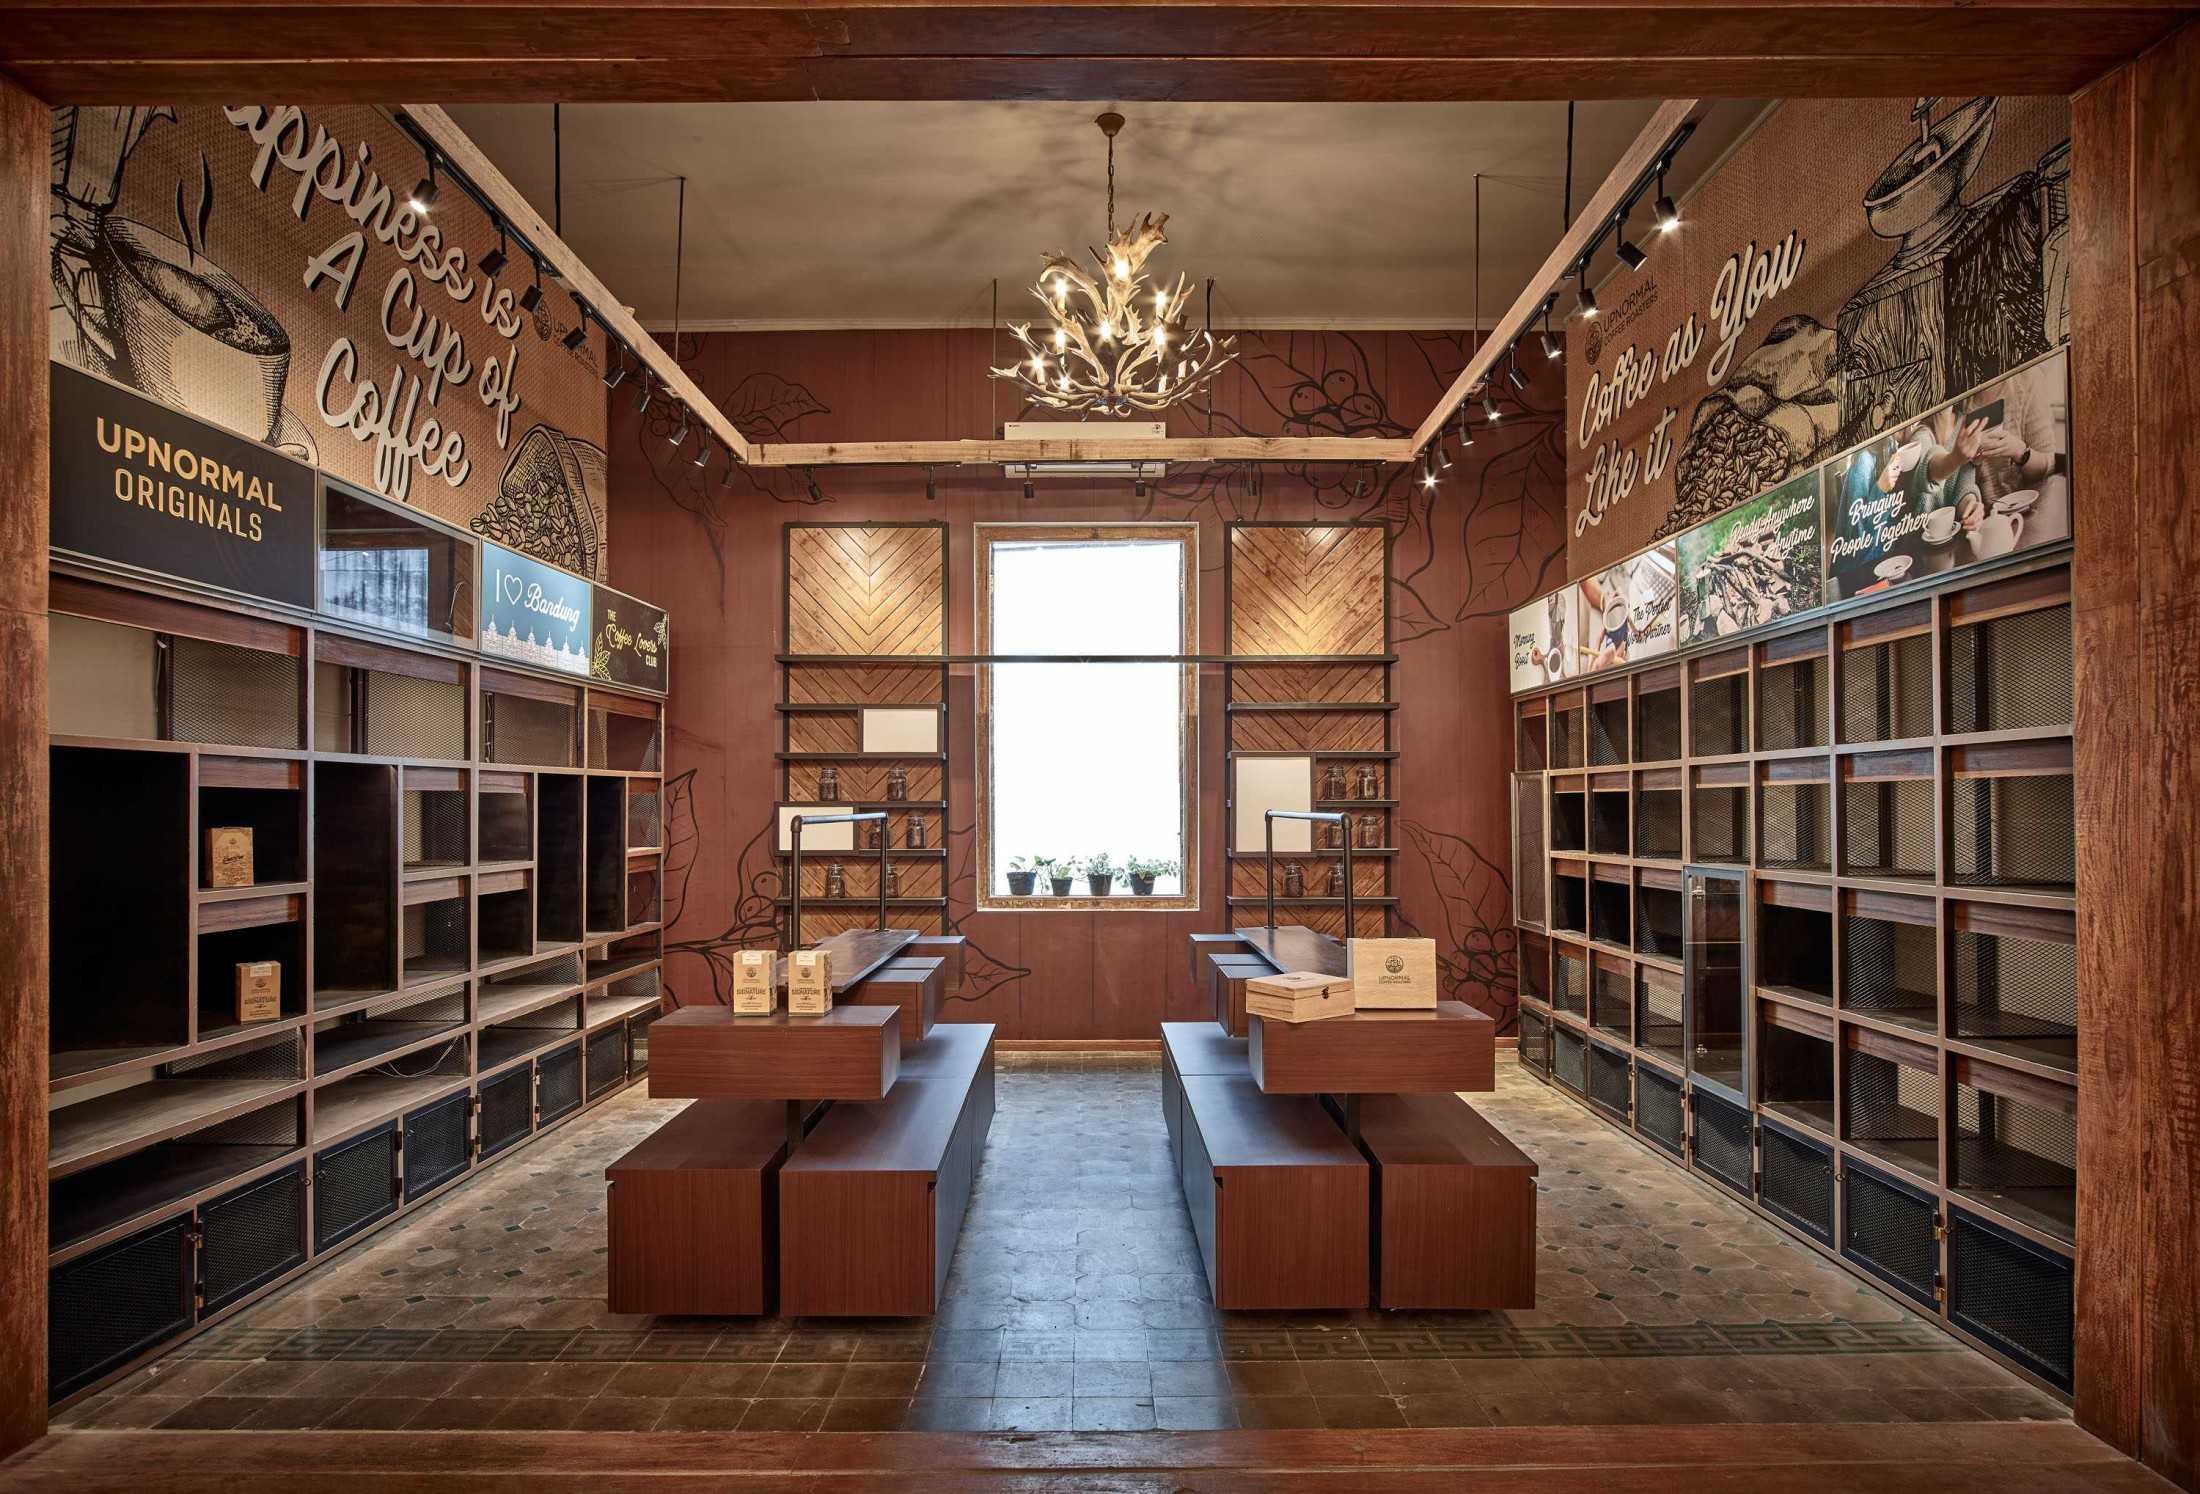 Desain interior kafe Upnormal Coffee Shop and Roastery karya Dinardithen Studio (Sumber: arsitag.com)